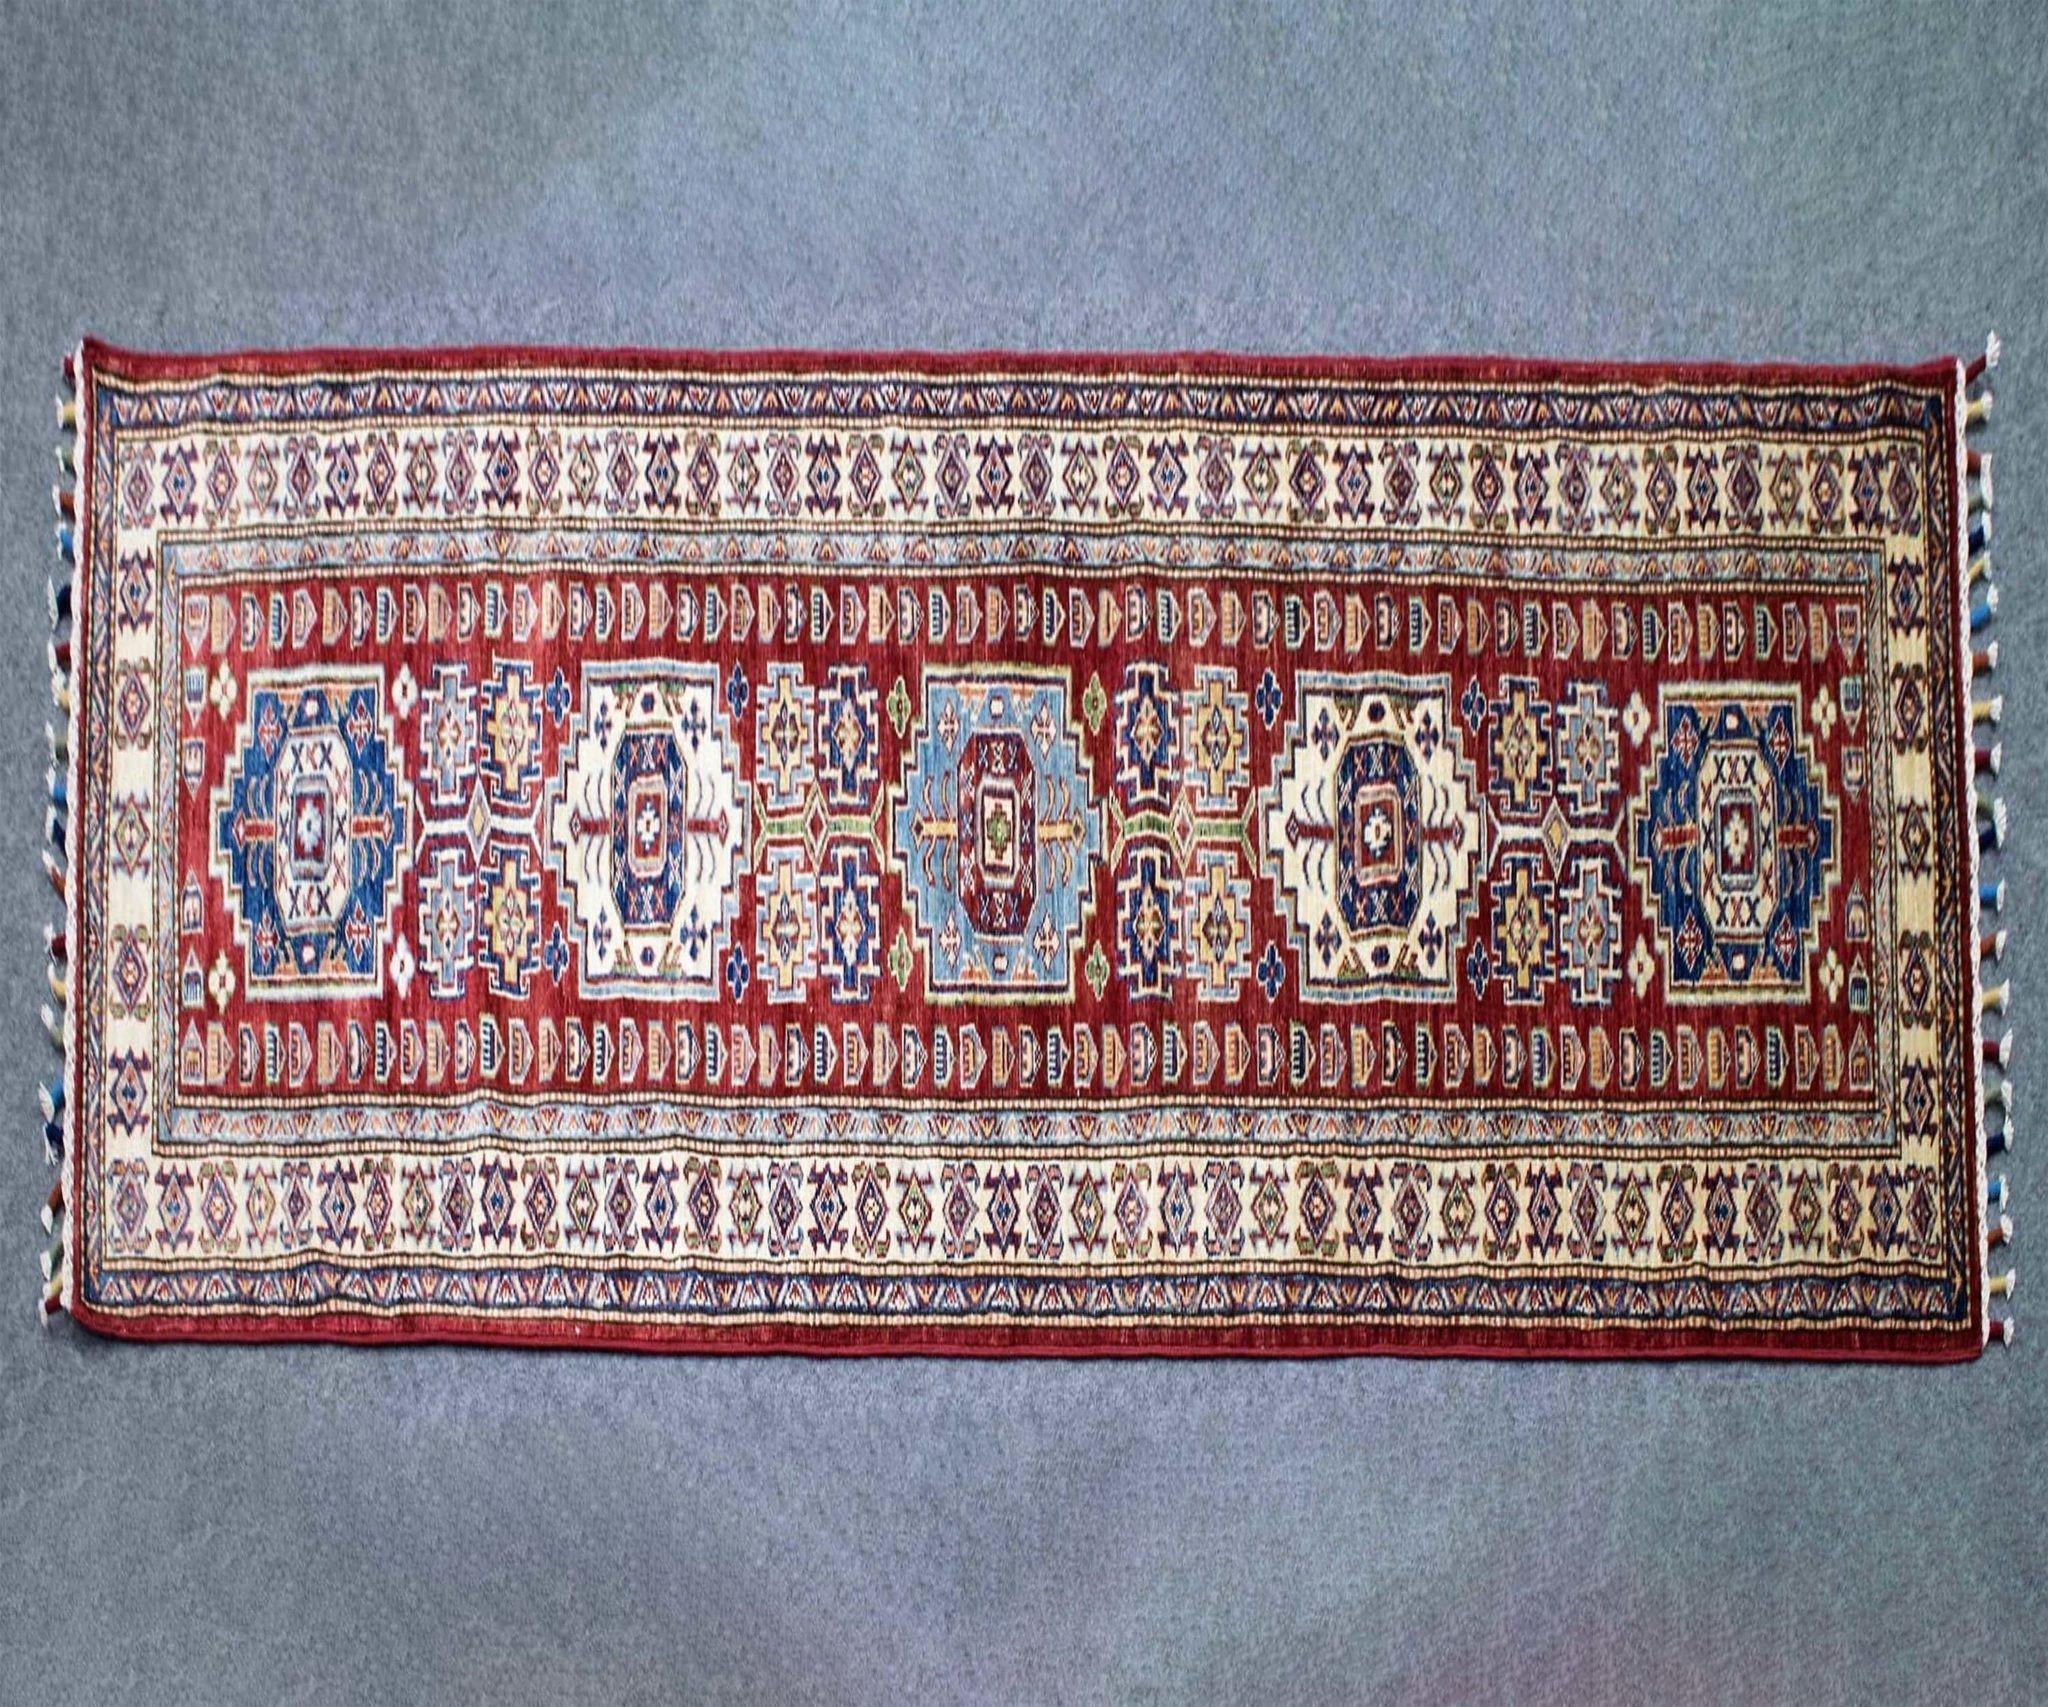 Soft Rugs for Bedroom Inspirational 3x10 Elegant Traditional Super Kazak Sk 111